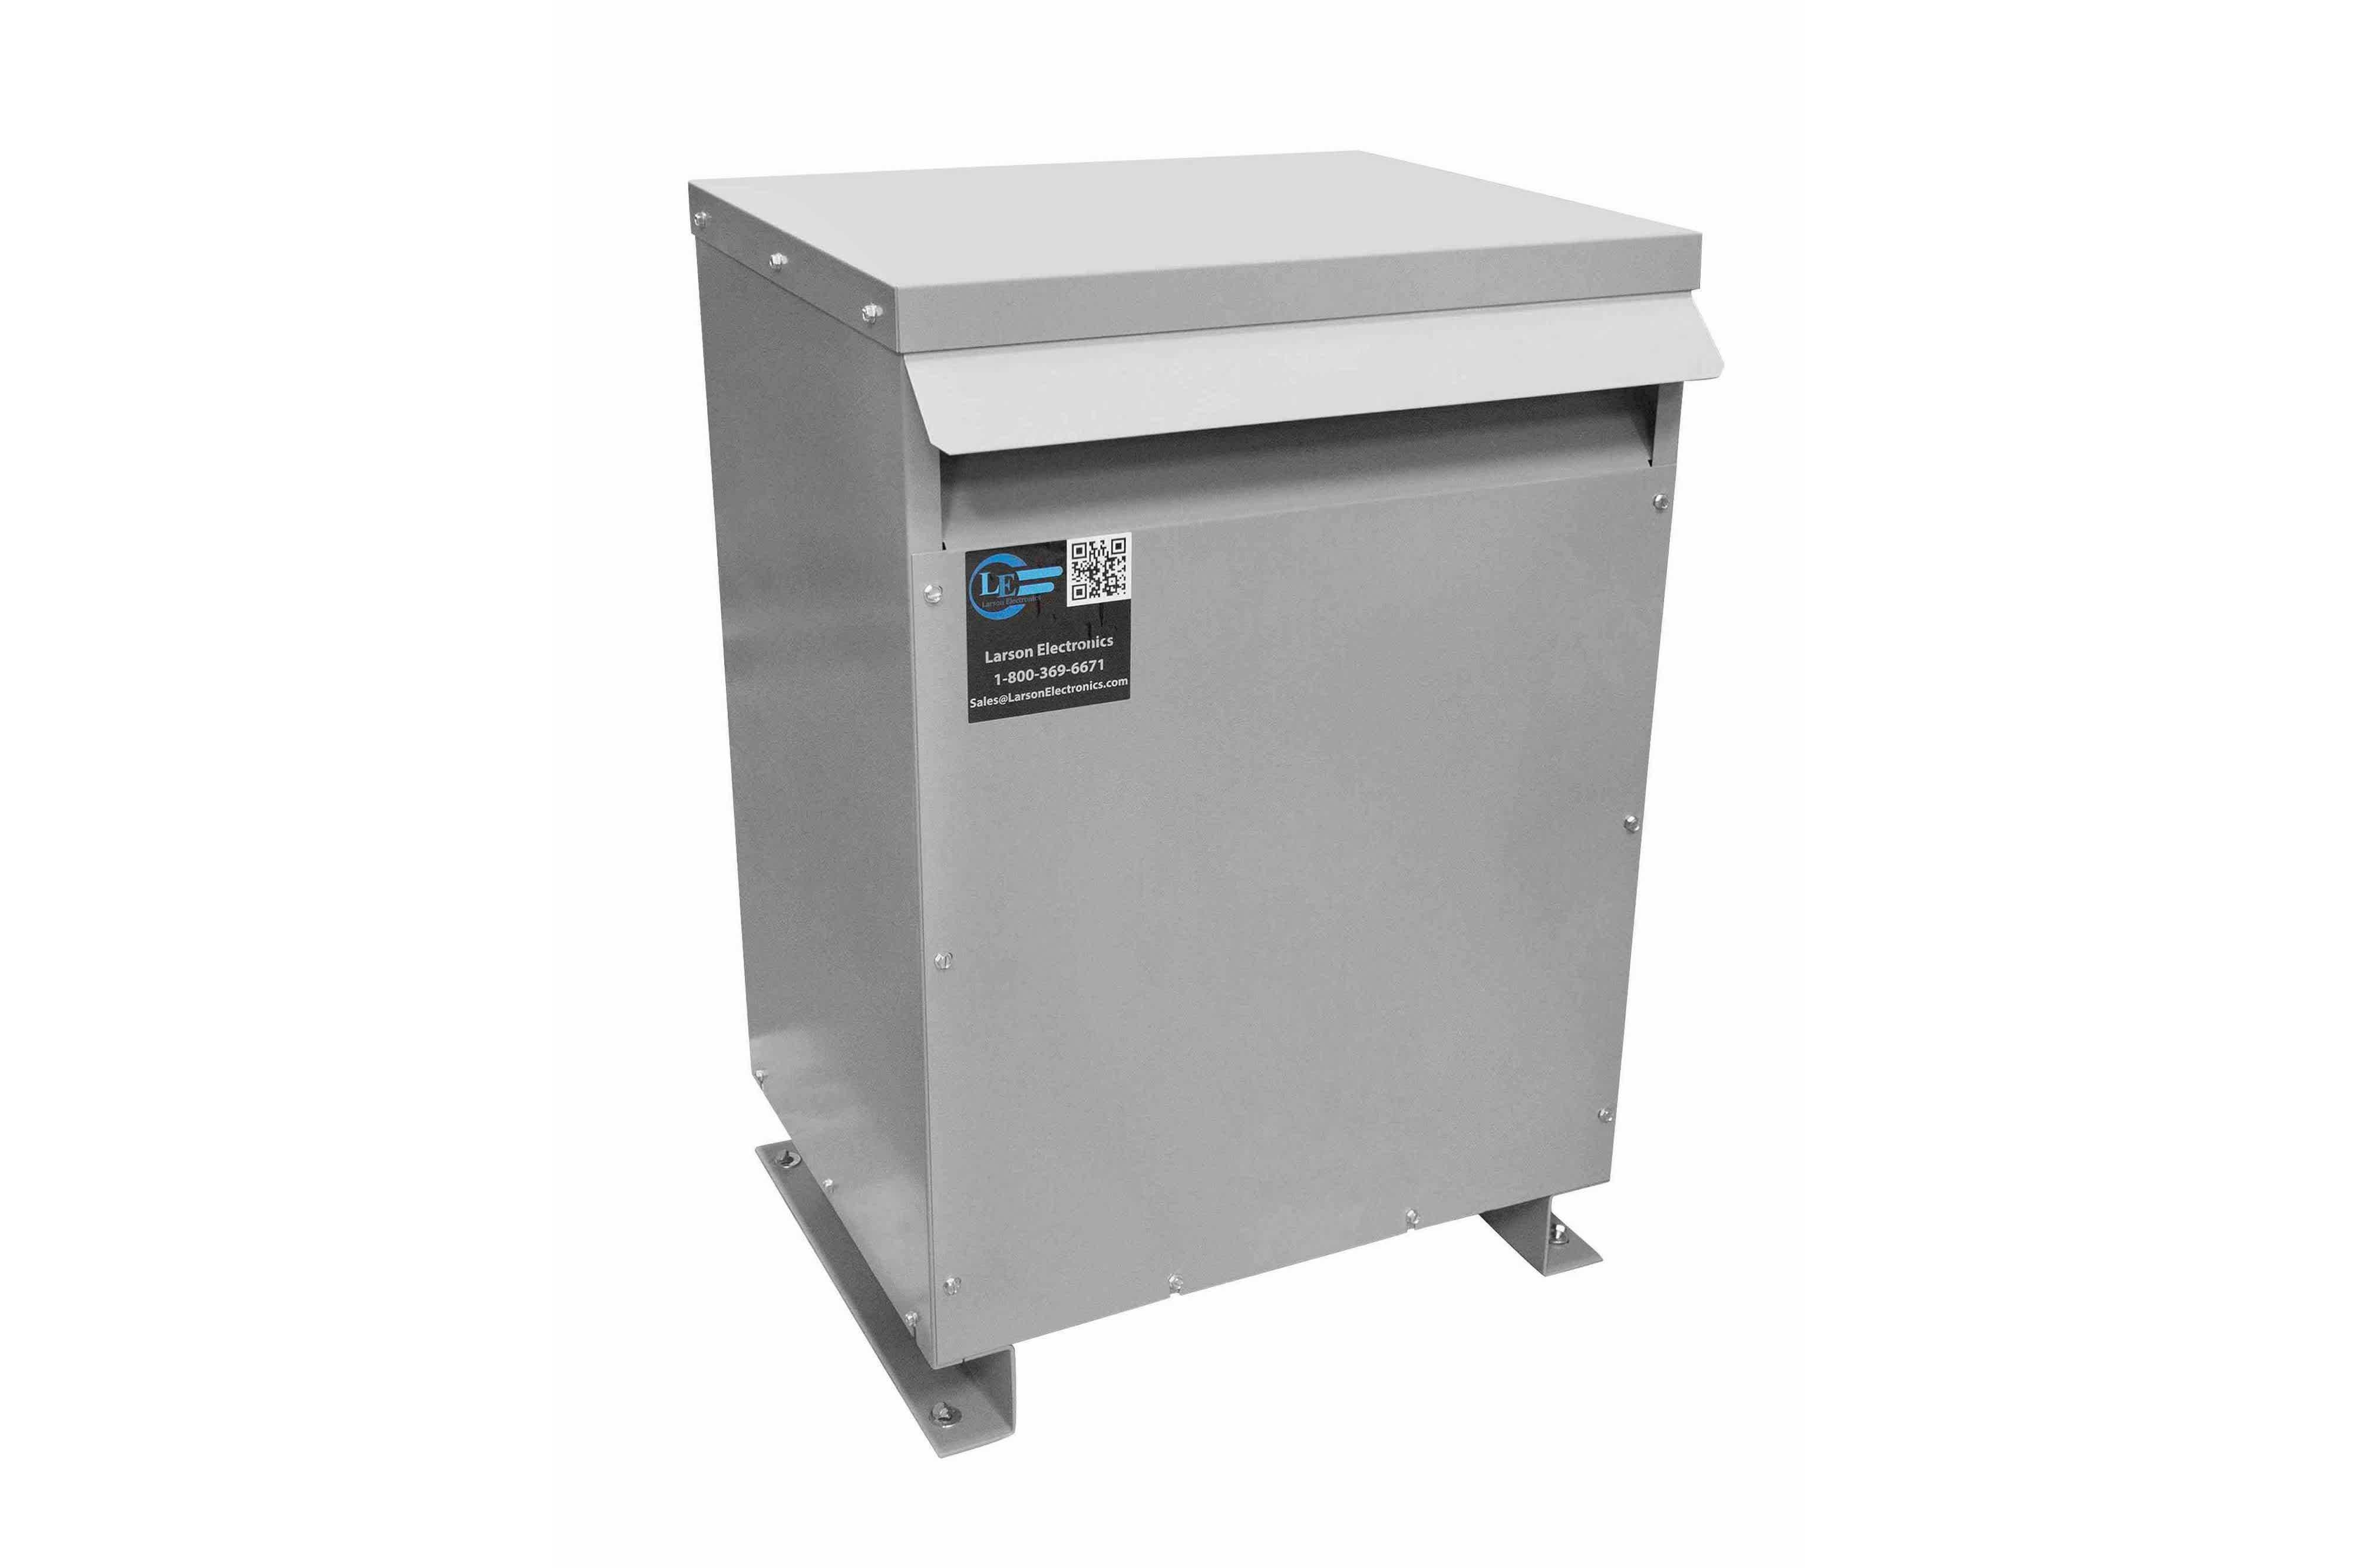 38 kVA 3PH Isolation Transformer, 460V Wye Primary, 415V Delta Secondary, N3R, Ventilated, 60 Hz